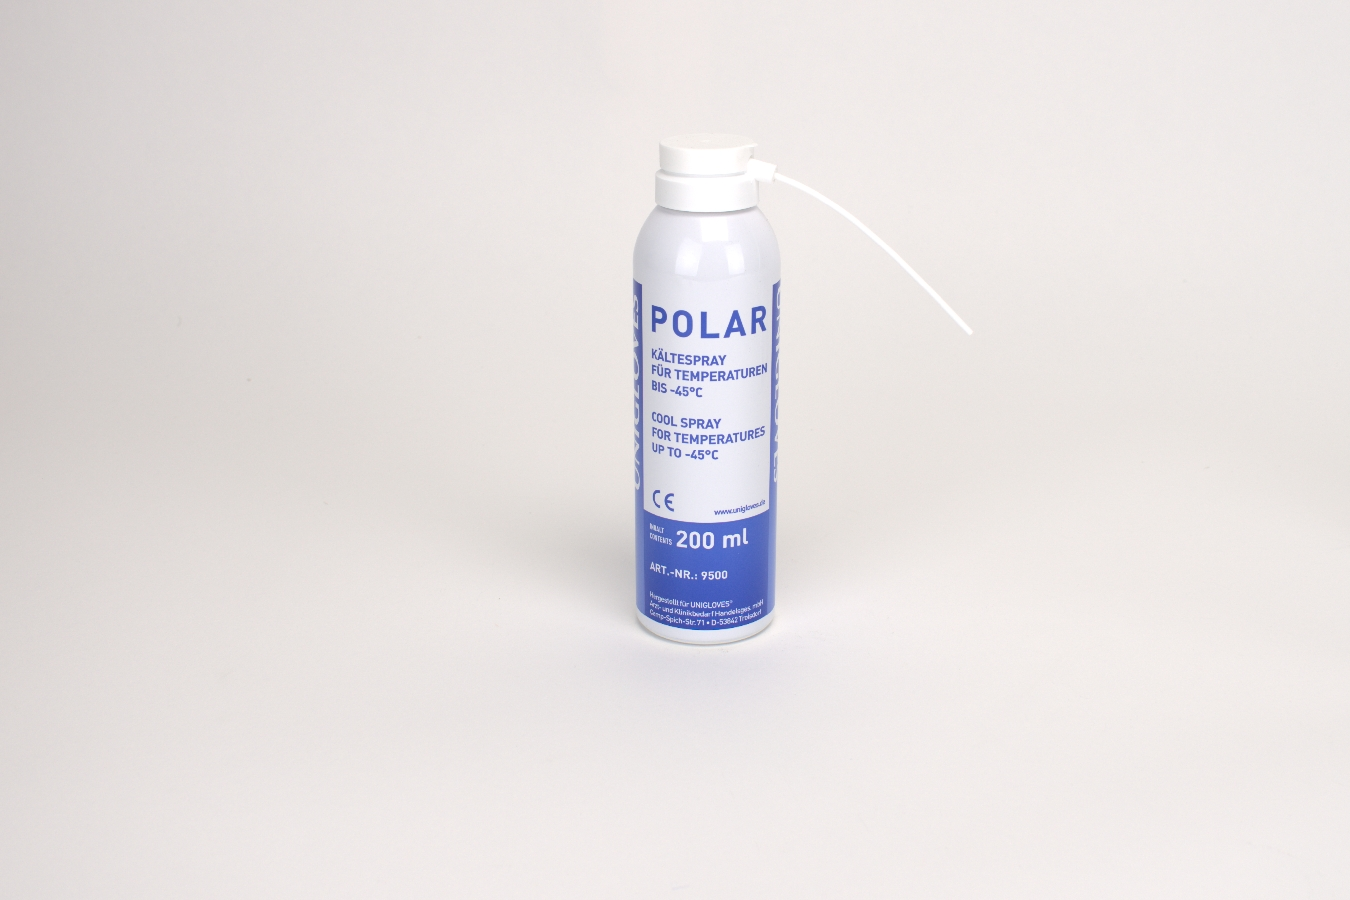 Dental Praxisbedarf & Zubehör: Polar Kältespray 200ml Dose